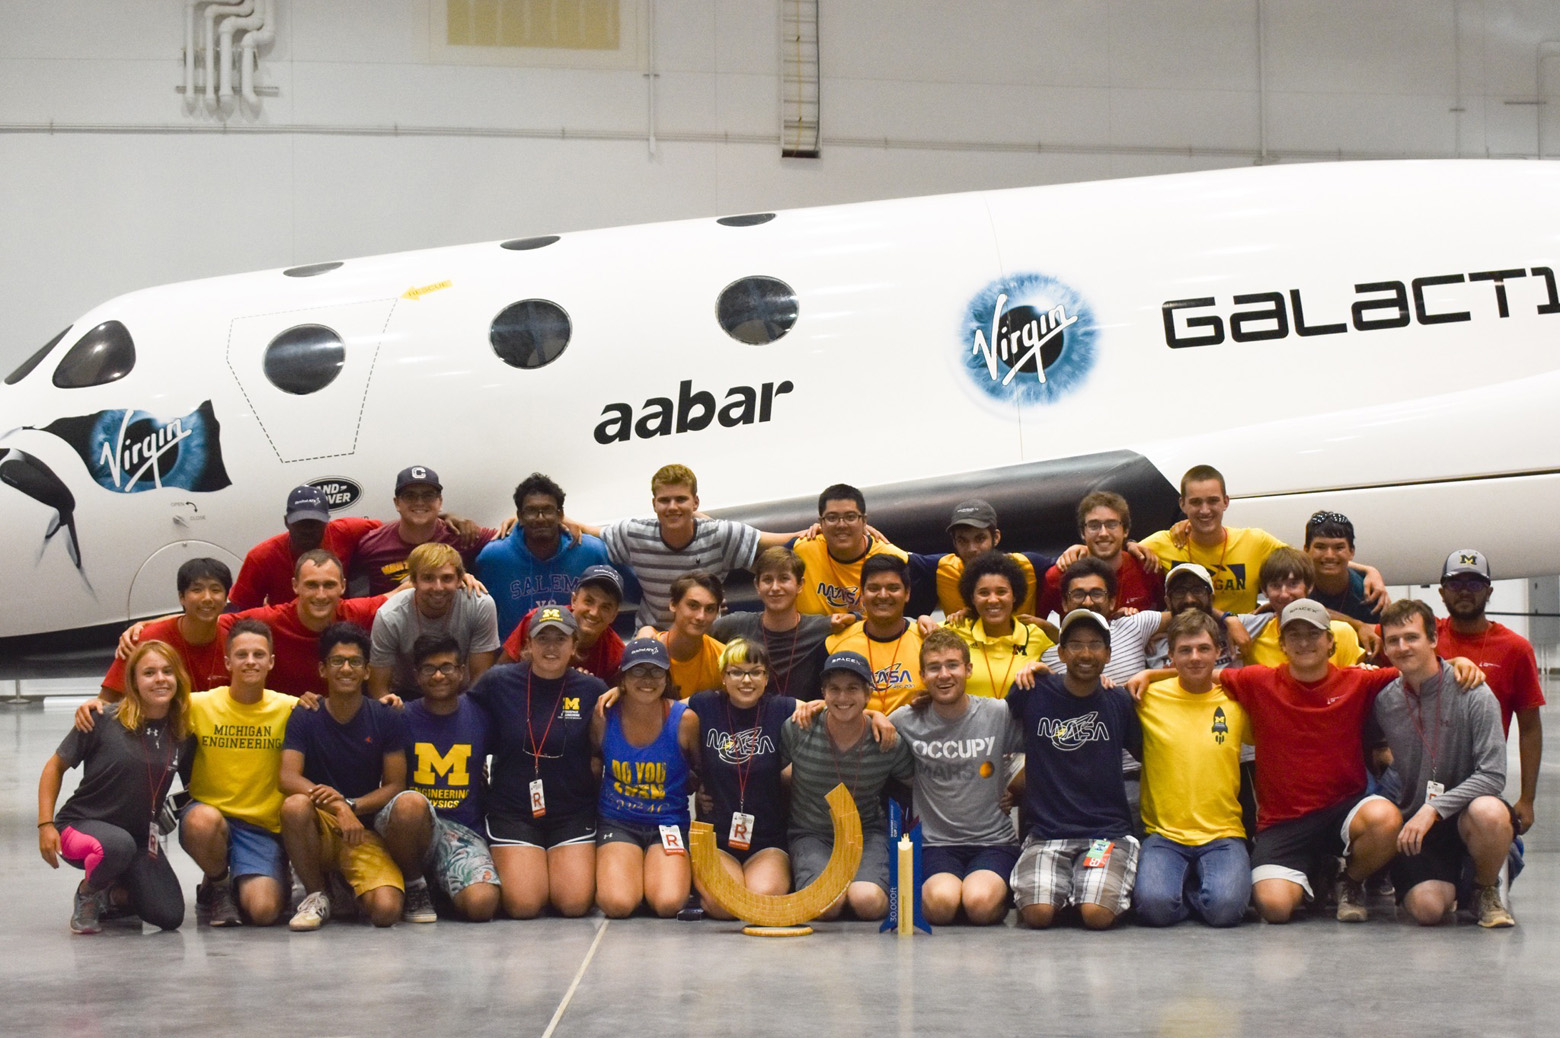 MASA team photo by a rocket